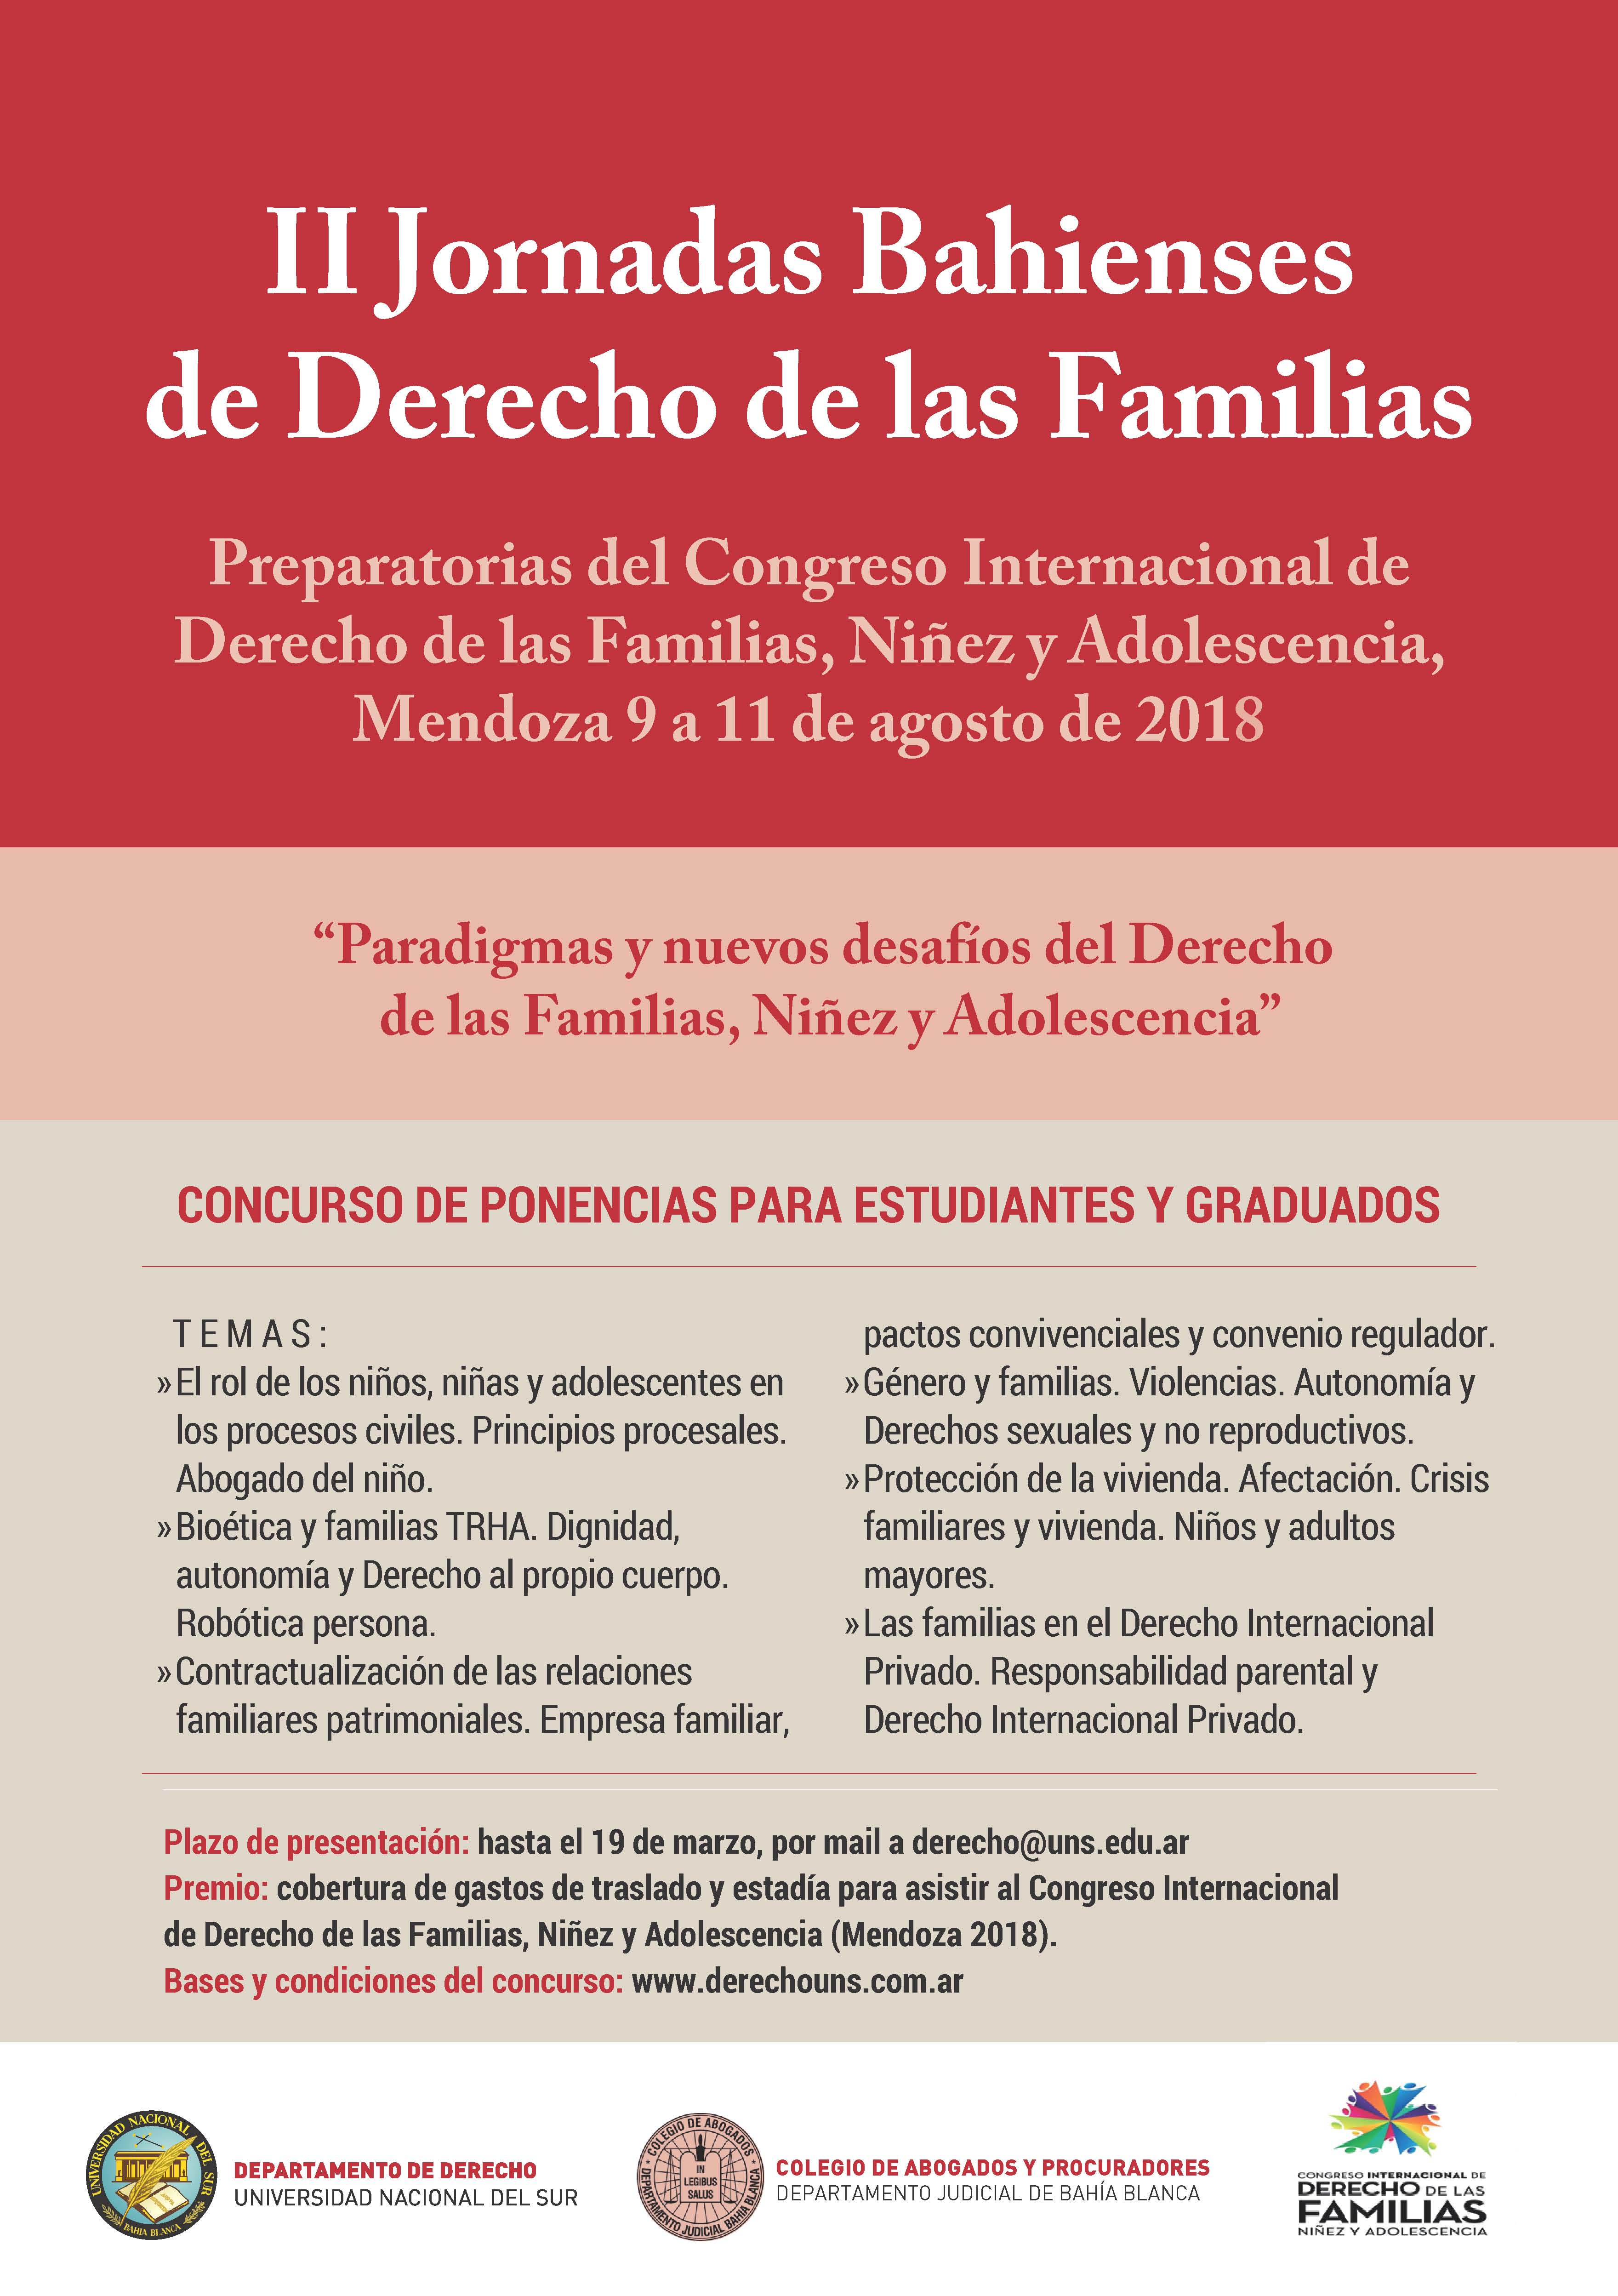 Concurso-ponencias-Jornadas-Familia